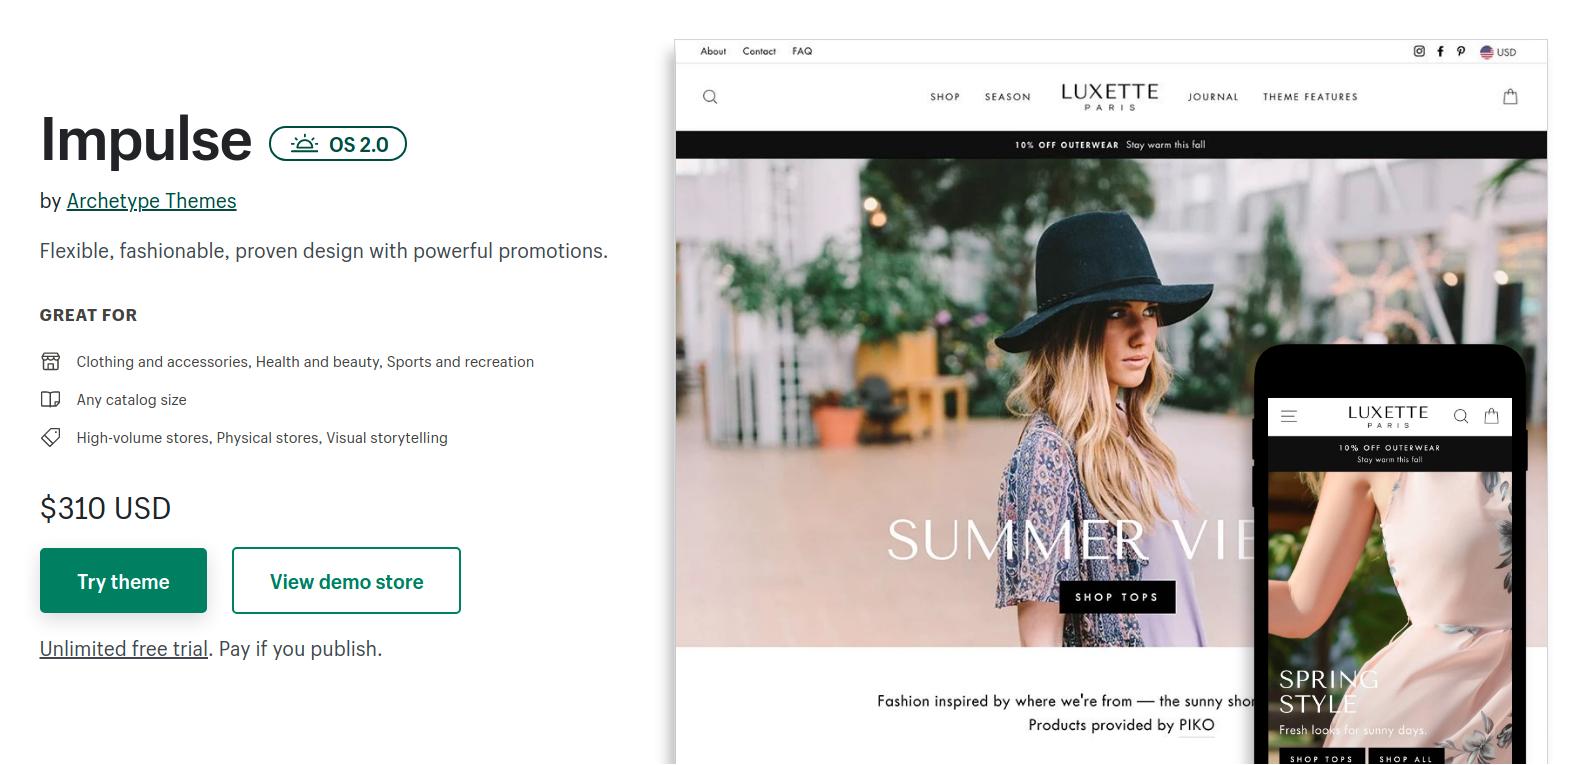 impulse-online-store-2-shopify-theme